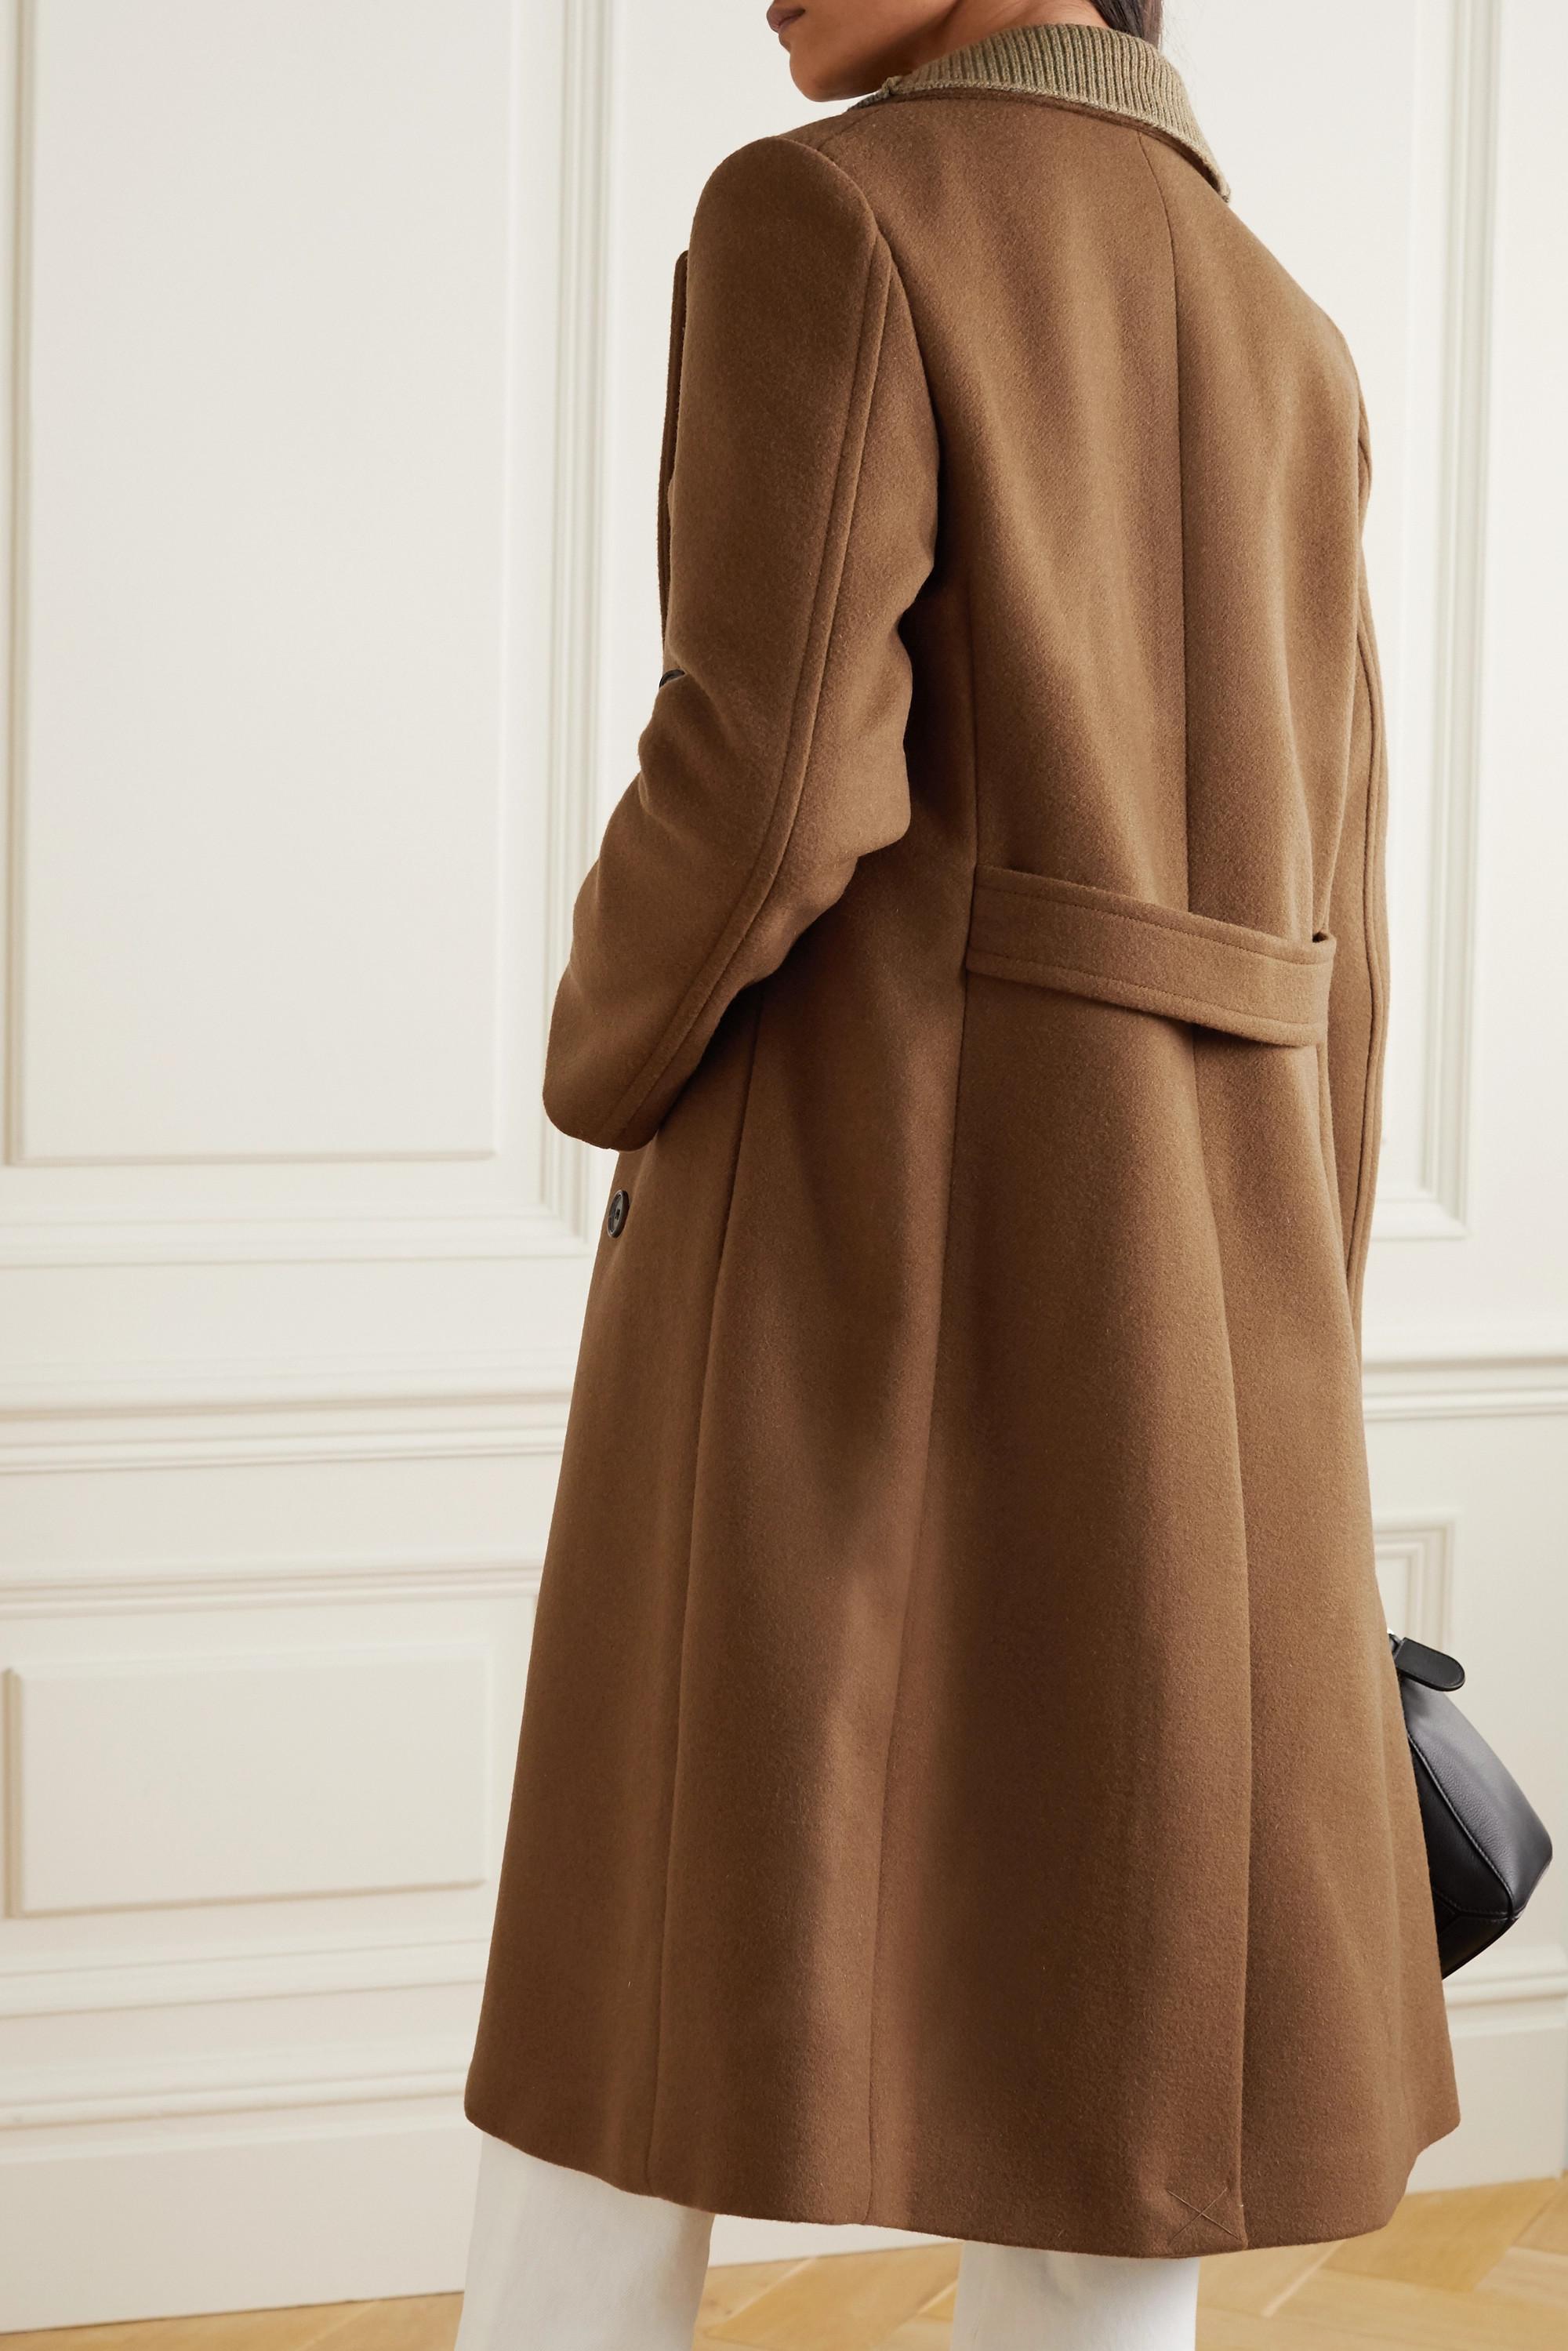 Nili Lotan Matthew double-breasted wool coat